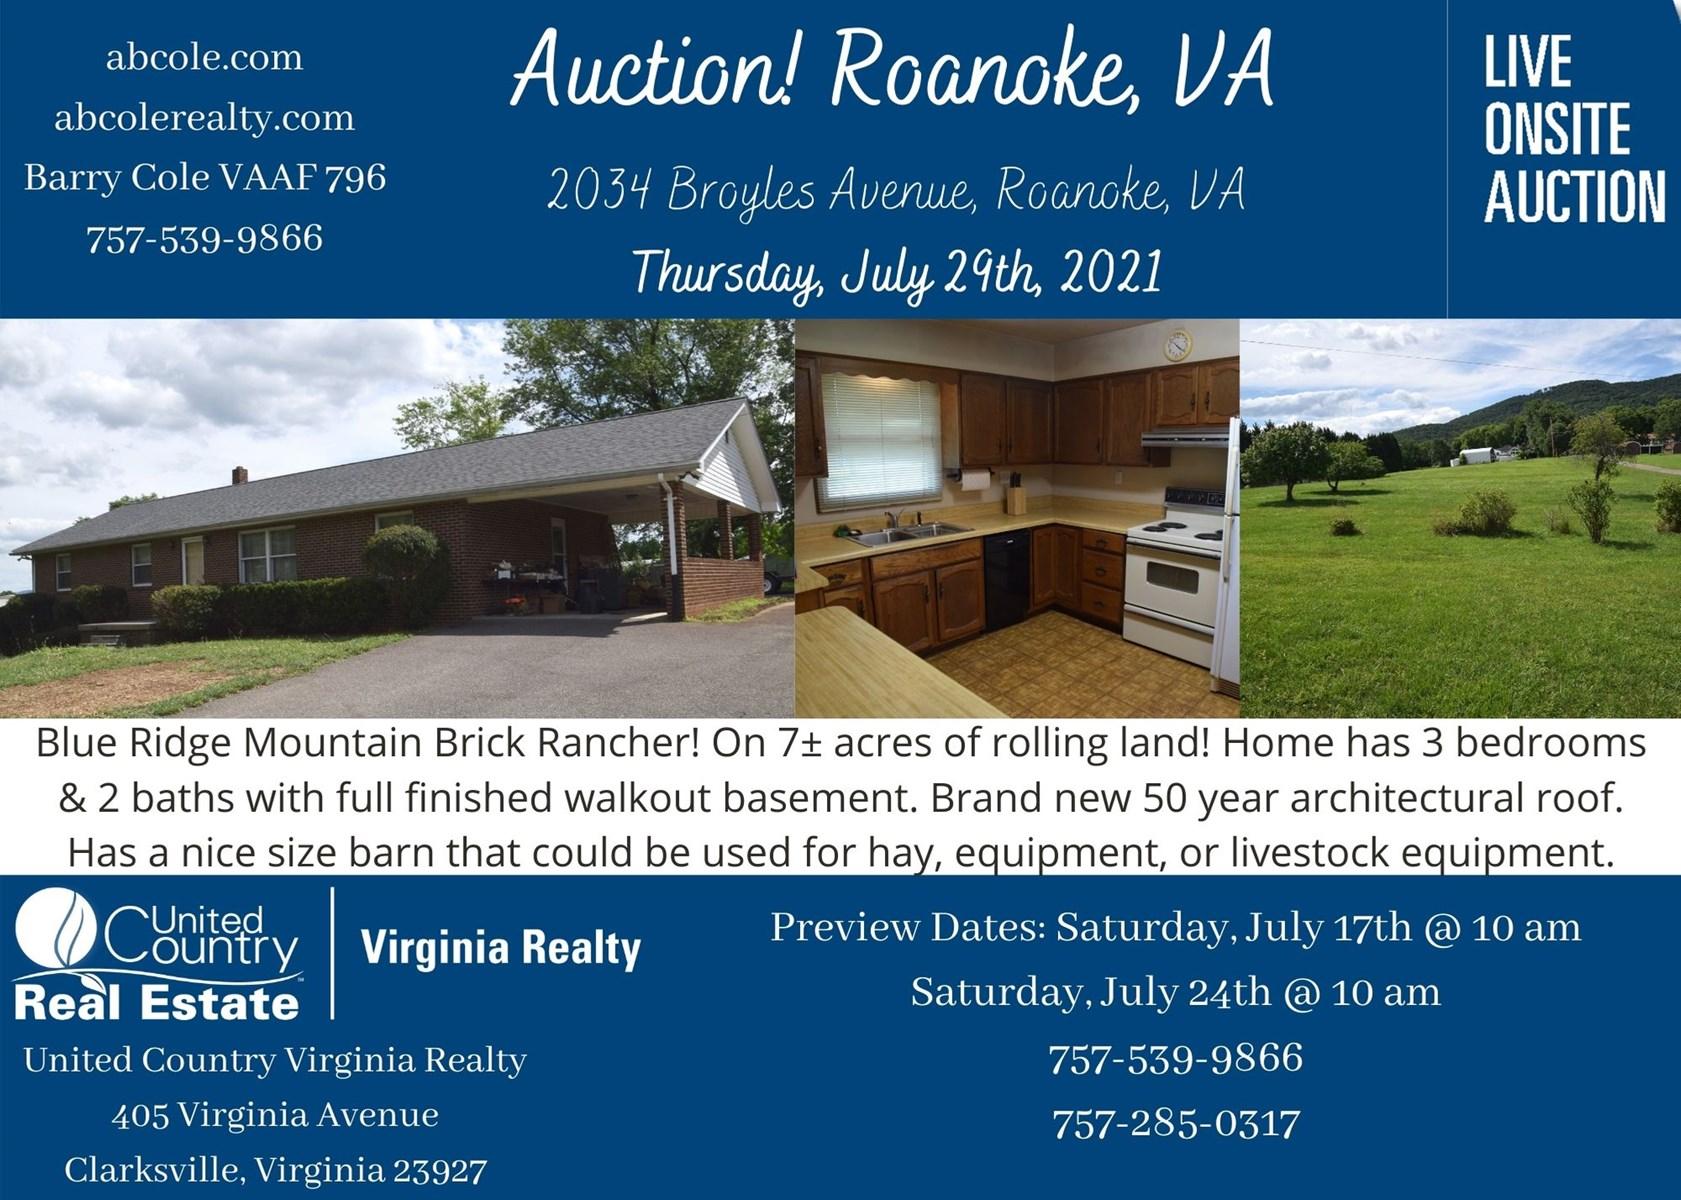 Blue Ridge Mountain Brick Rancher, VA